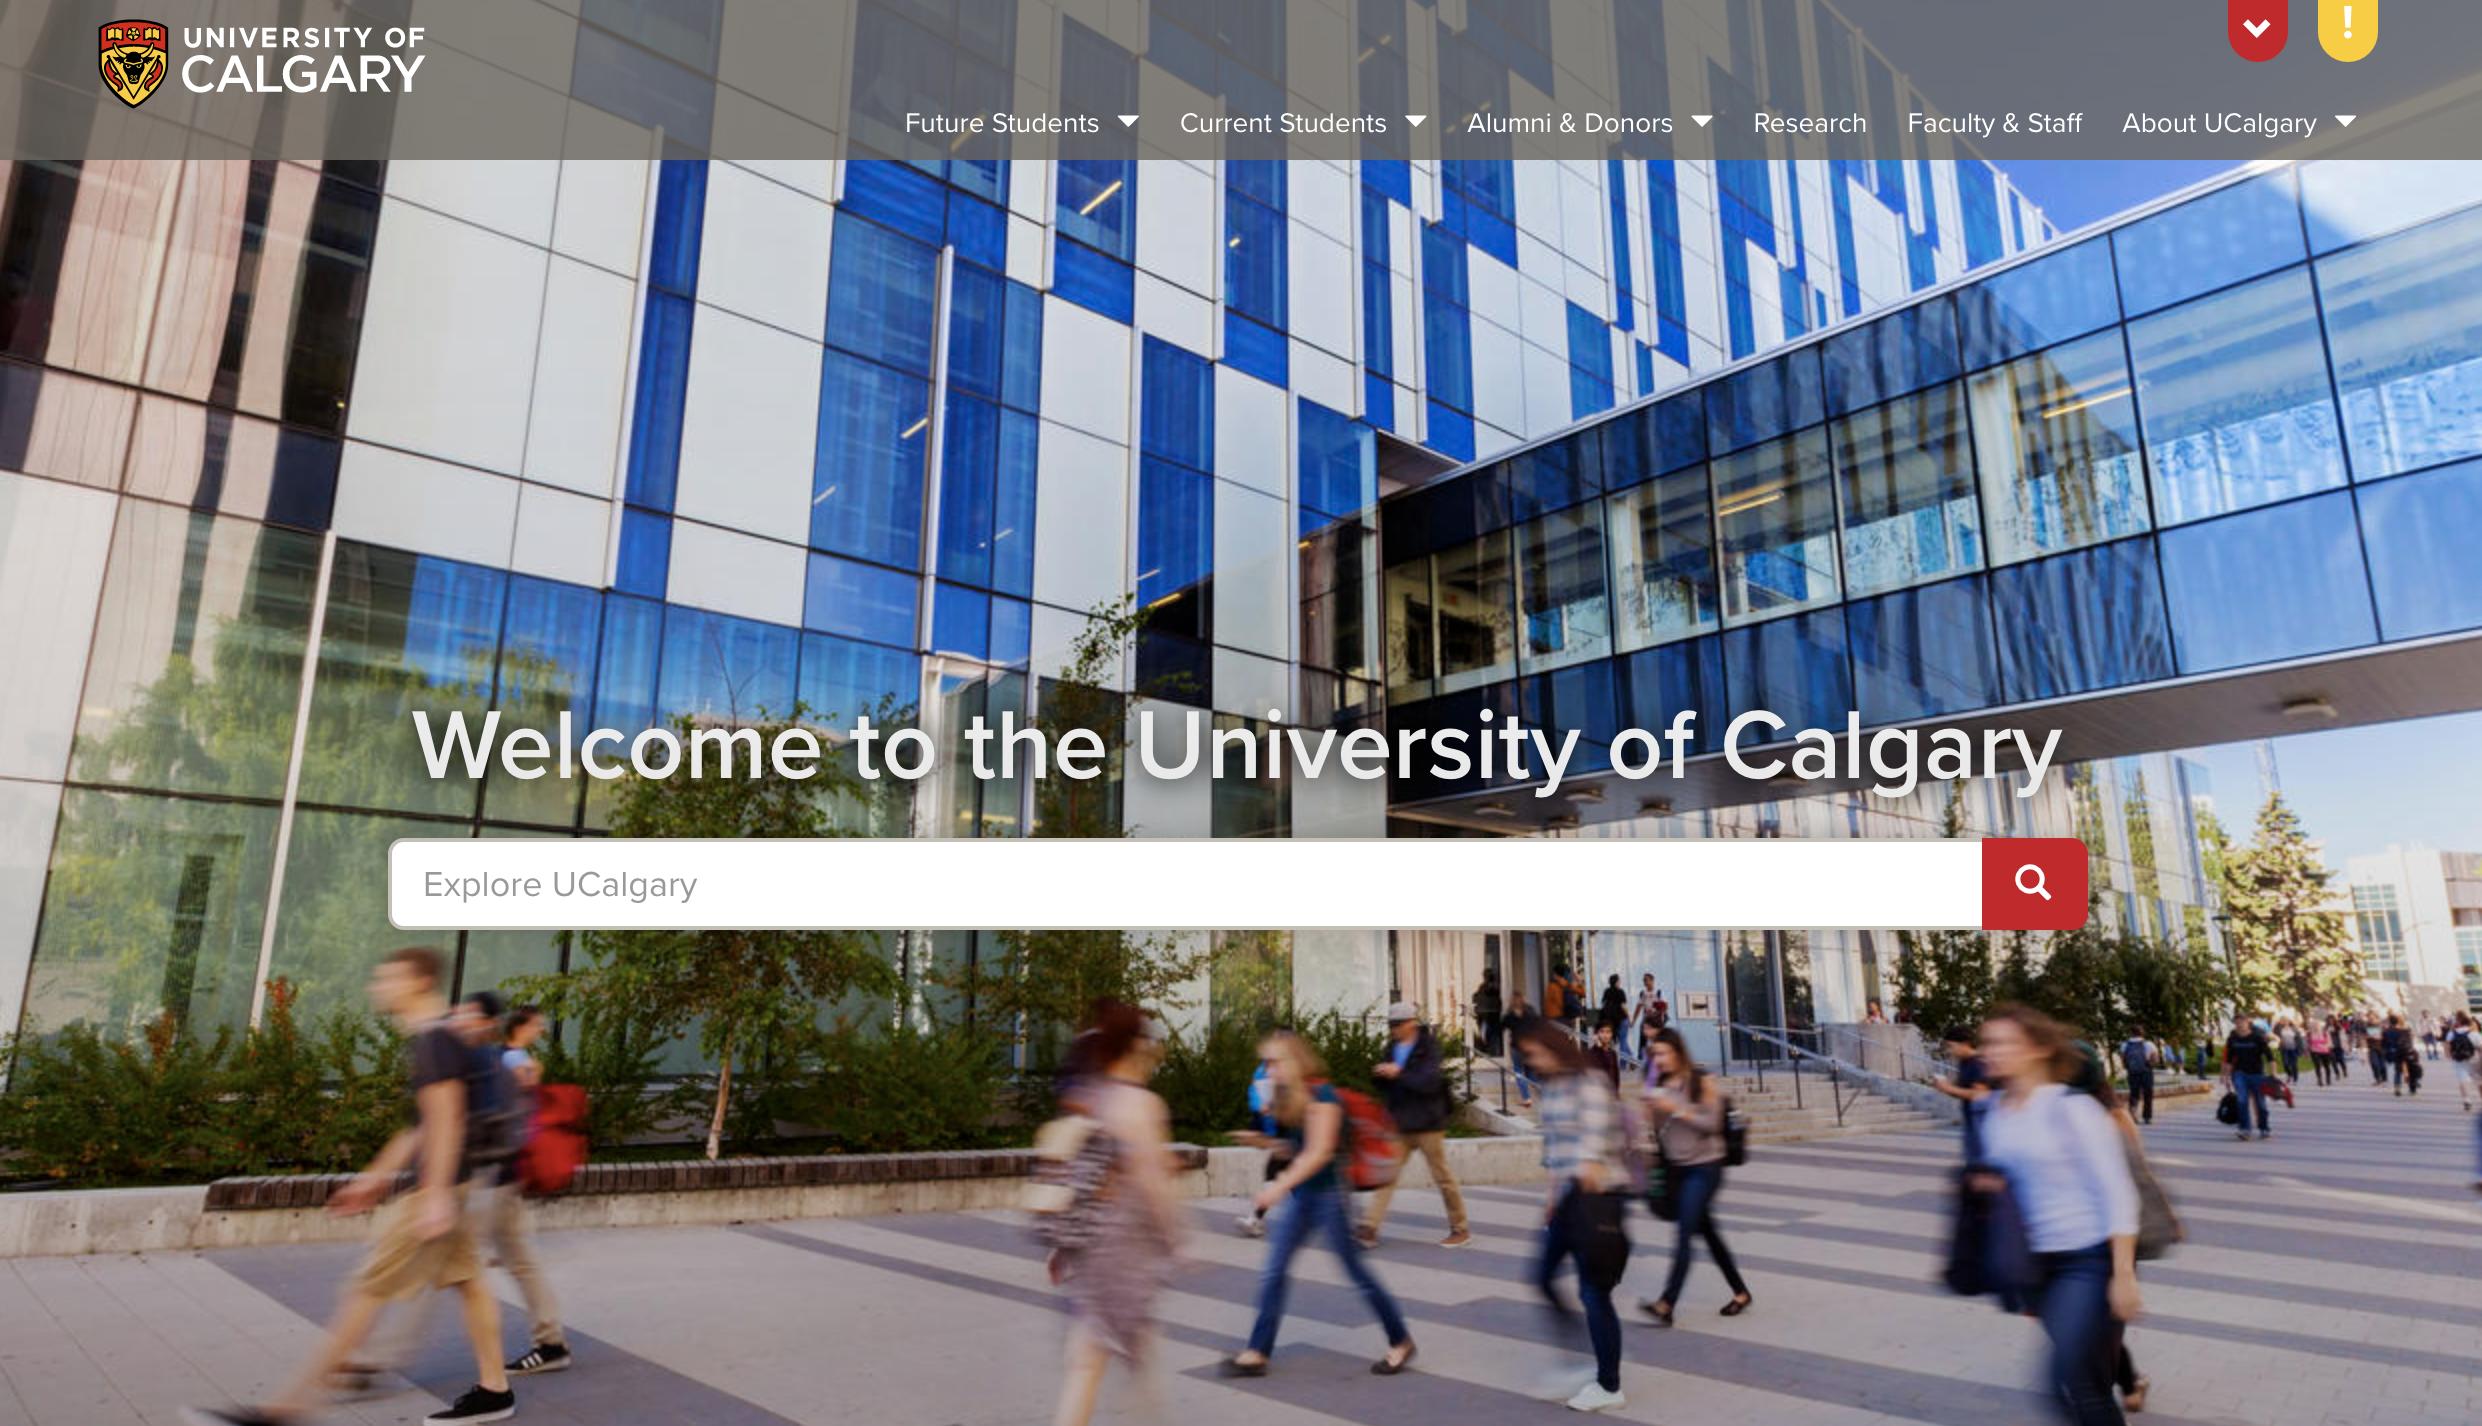 University of Calgary header